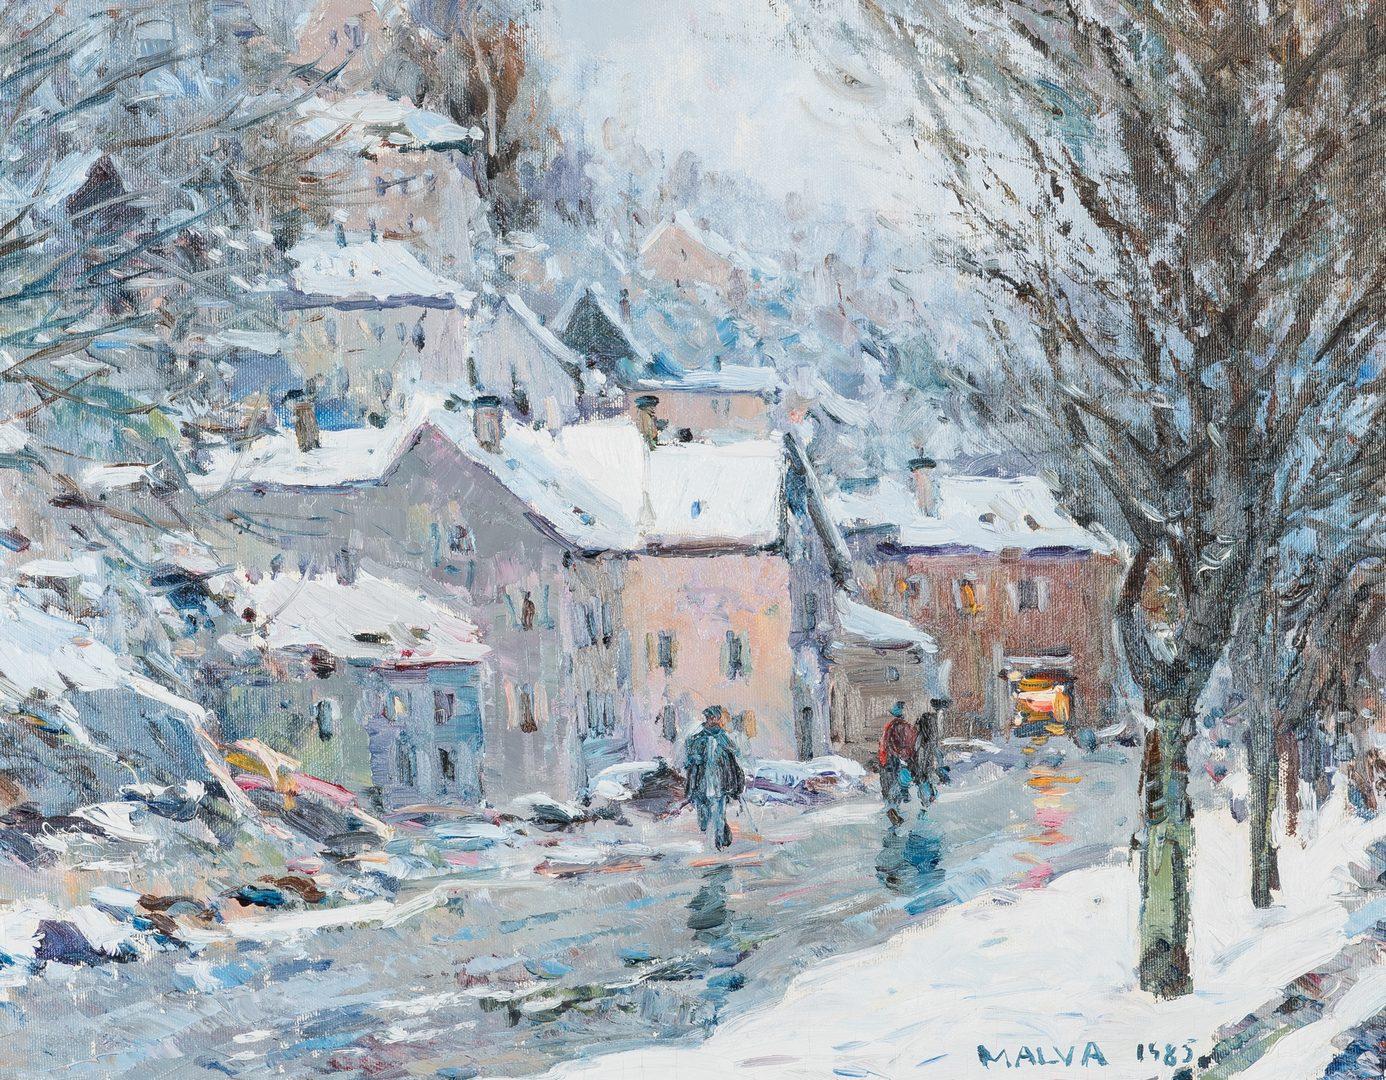 Lot 311: Malva O/C, Winter Landscape Painting